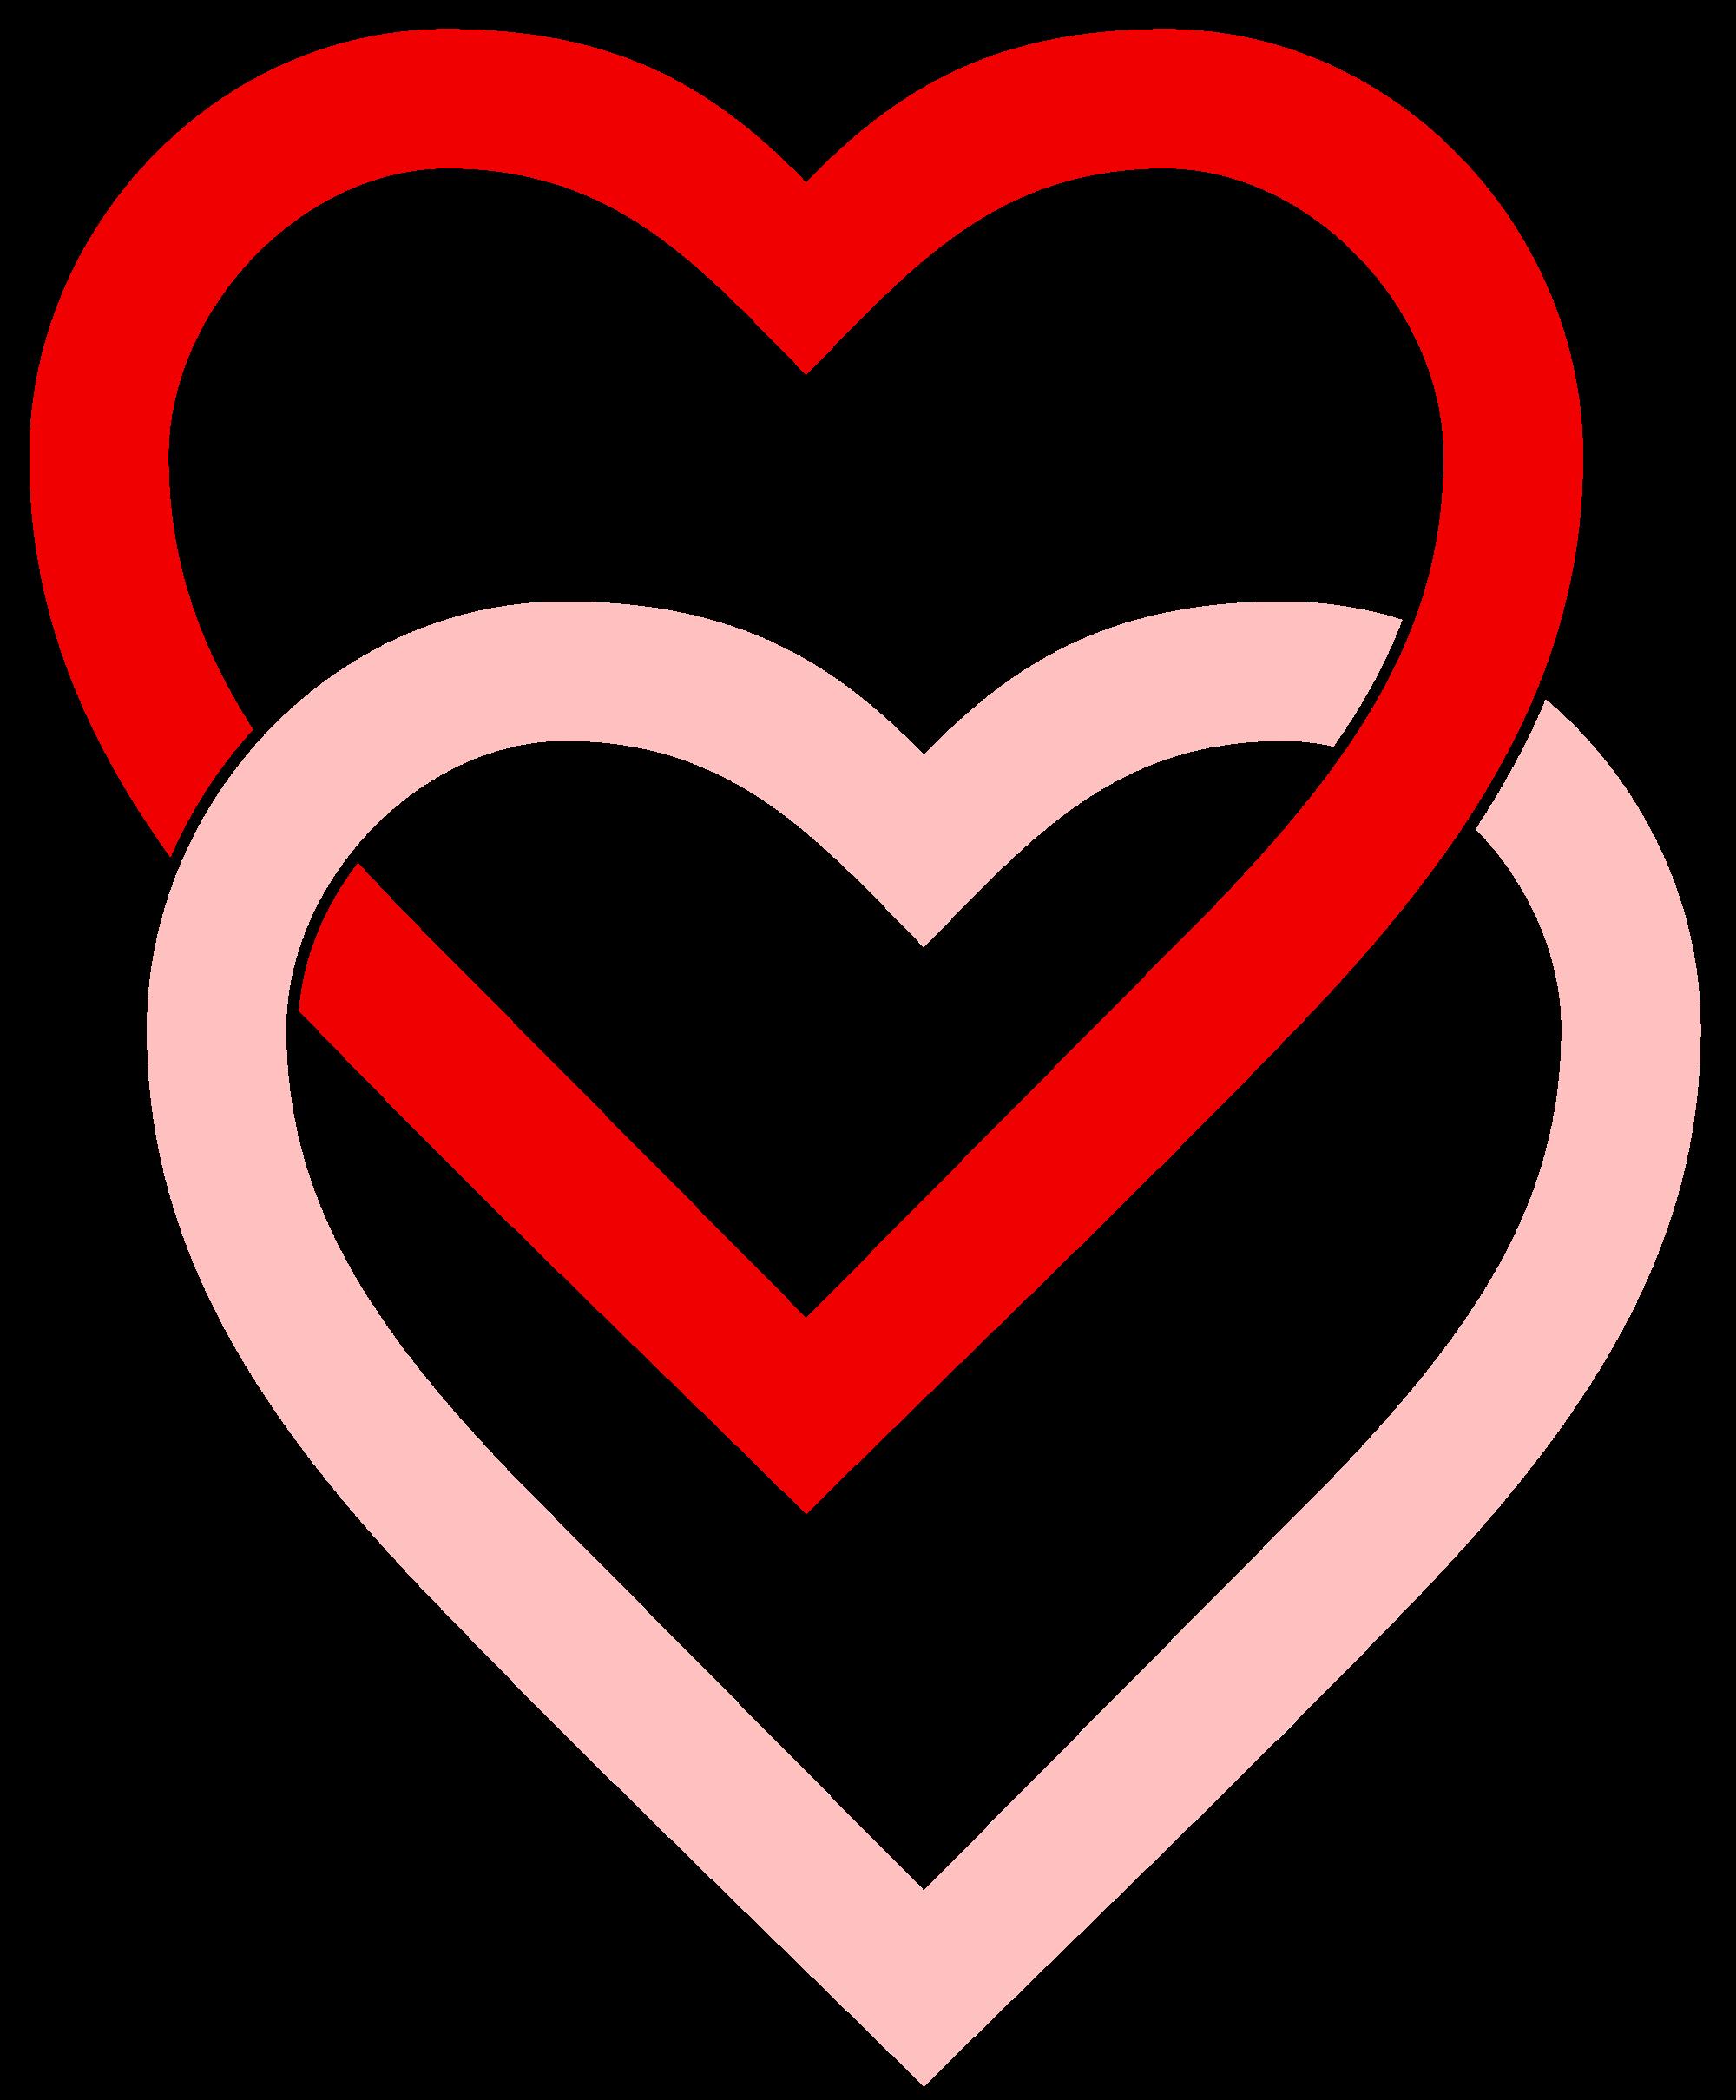 Love hearts png. File interlaced svg wikimedia